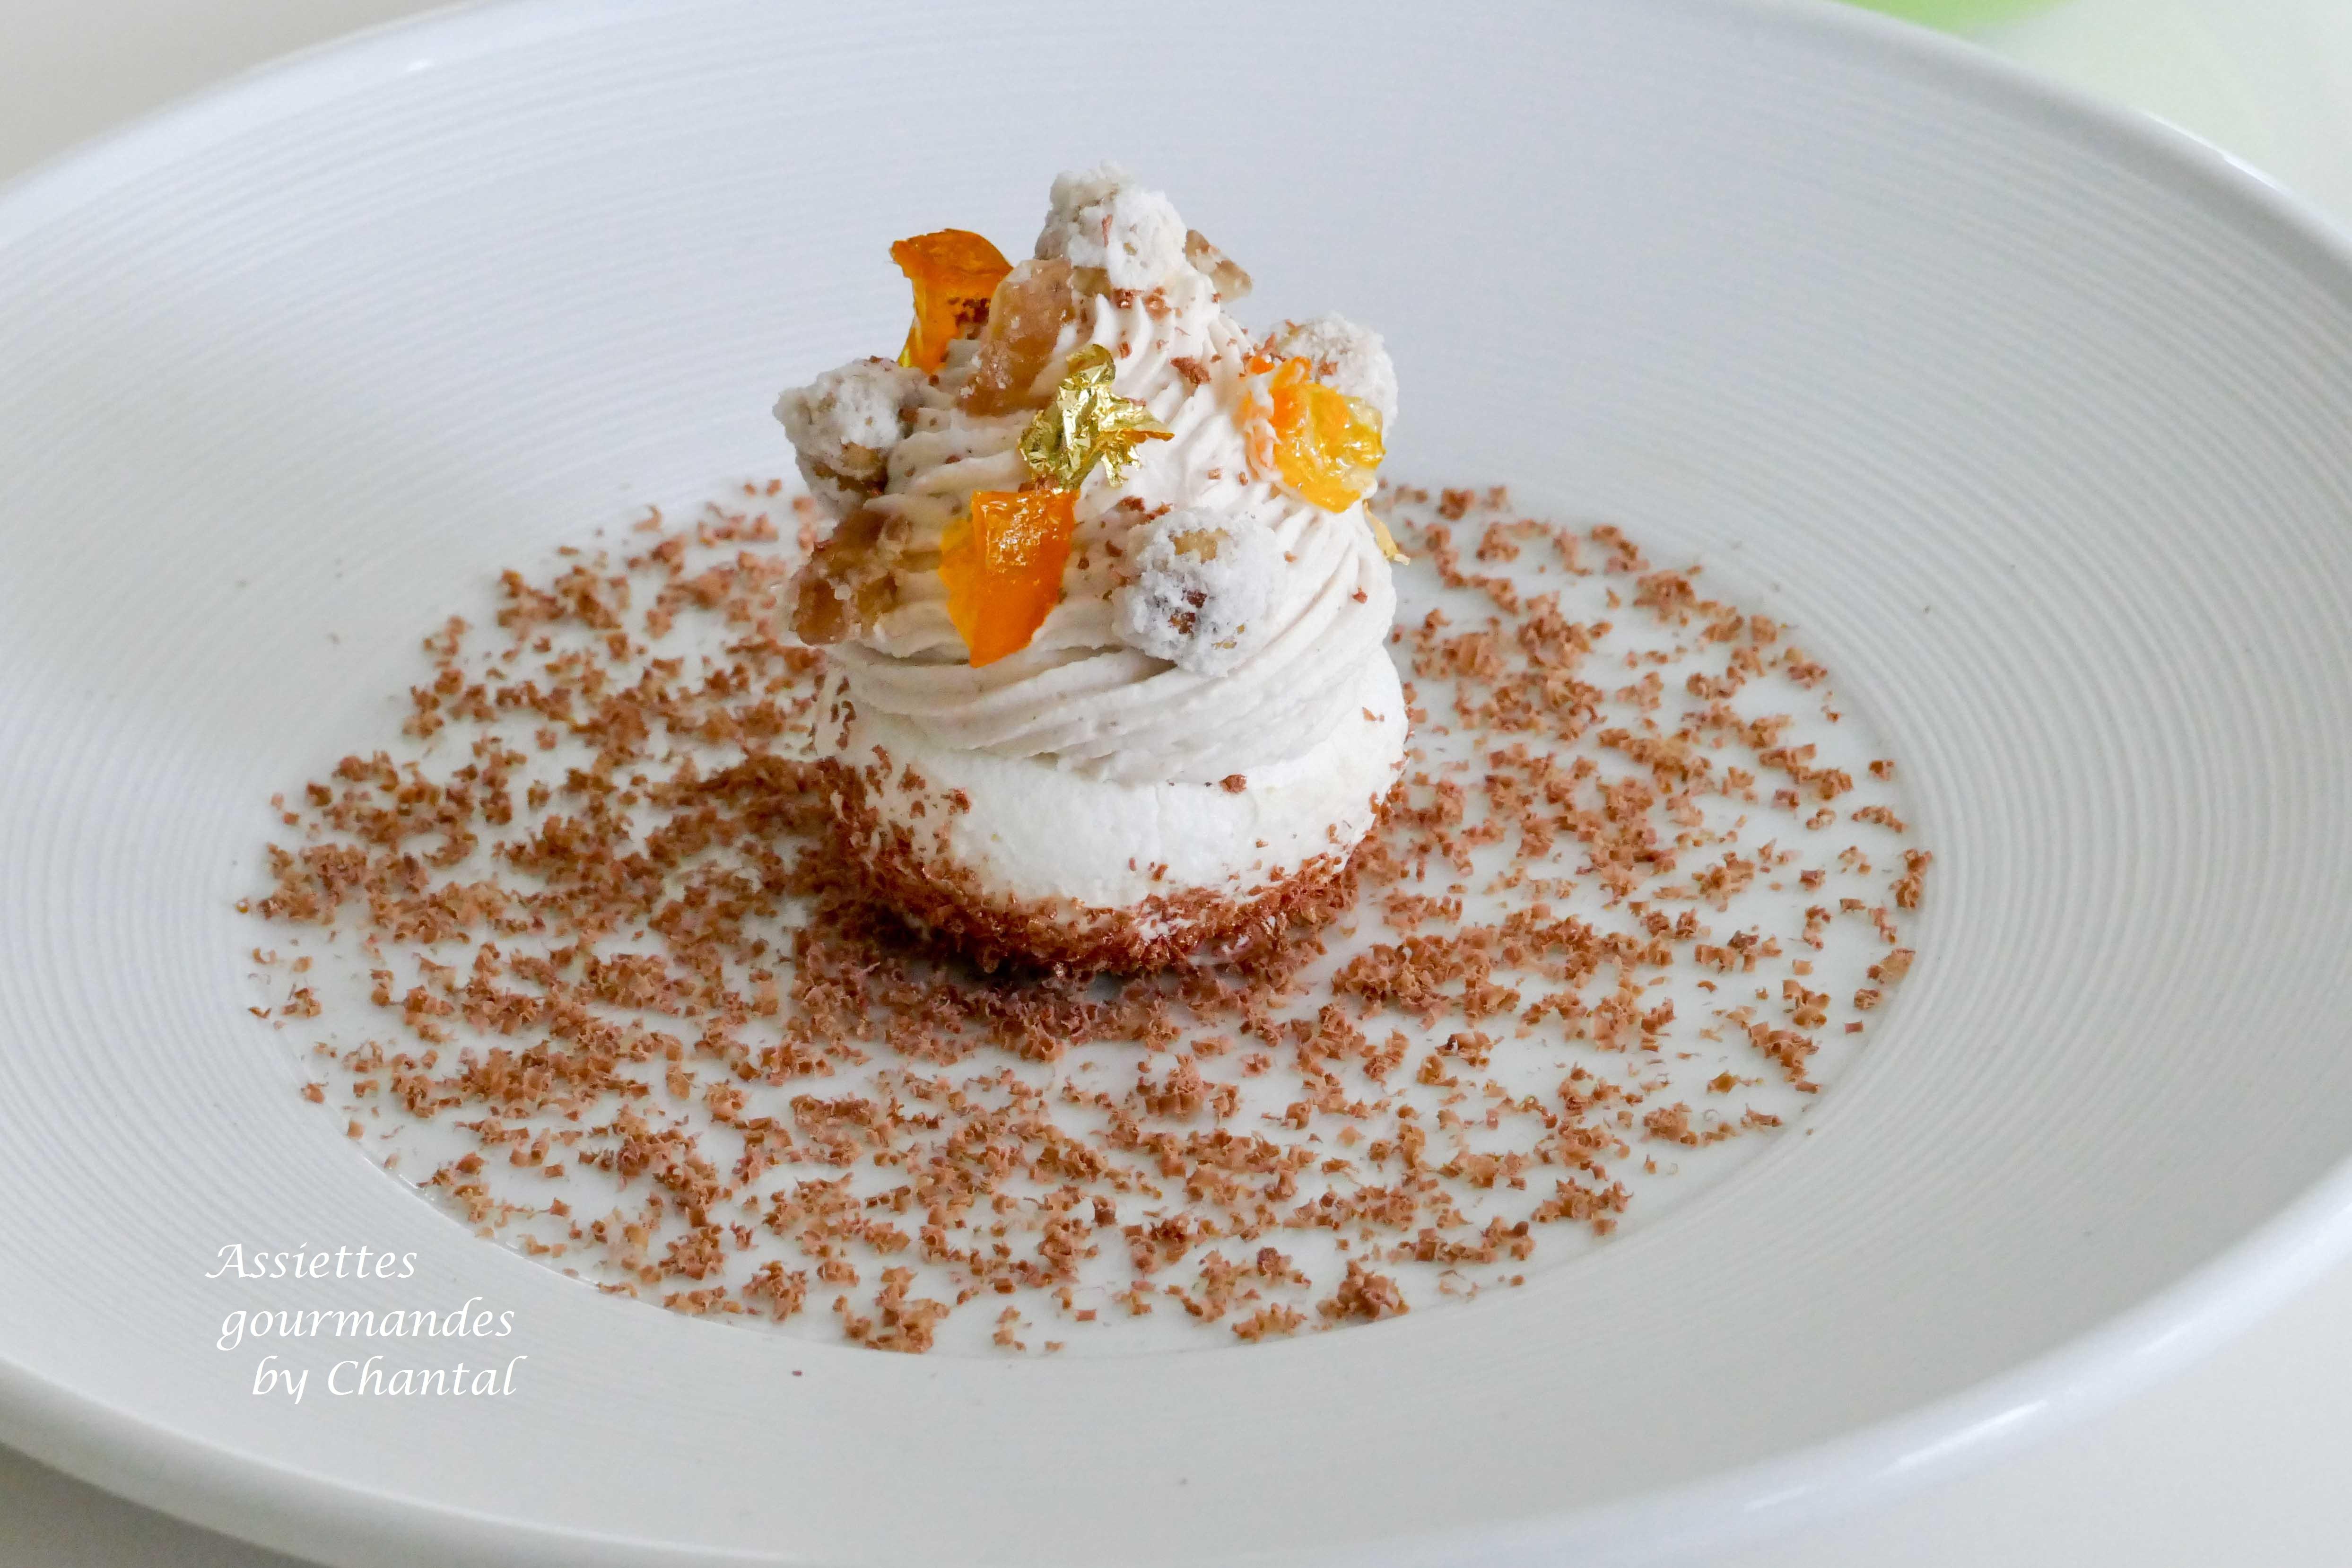 Mont-Blanc marron et mandarine - Stéphane Corolleur